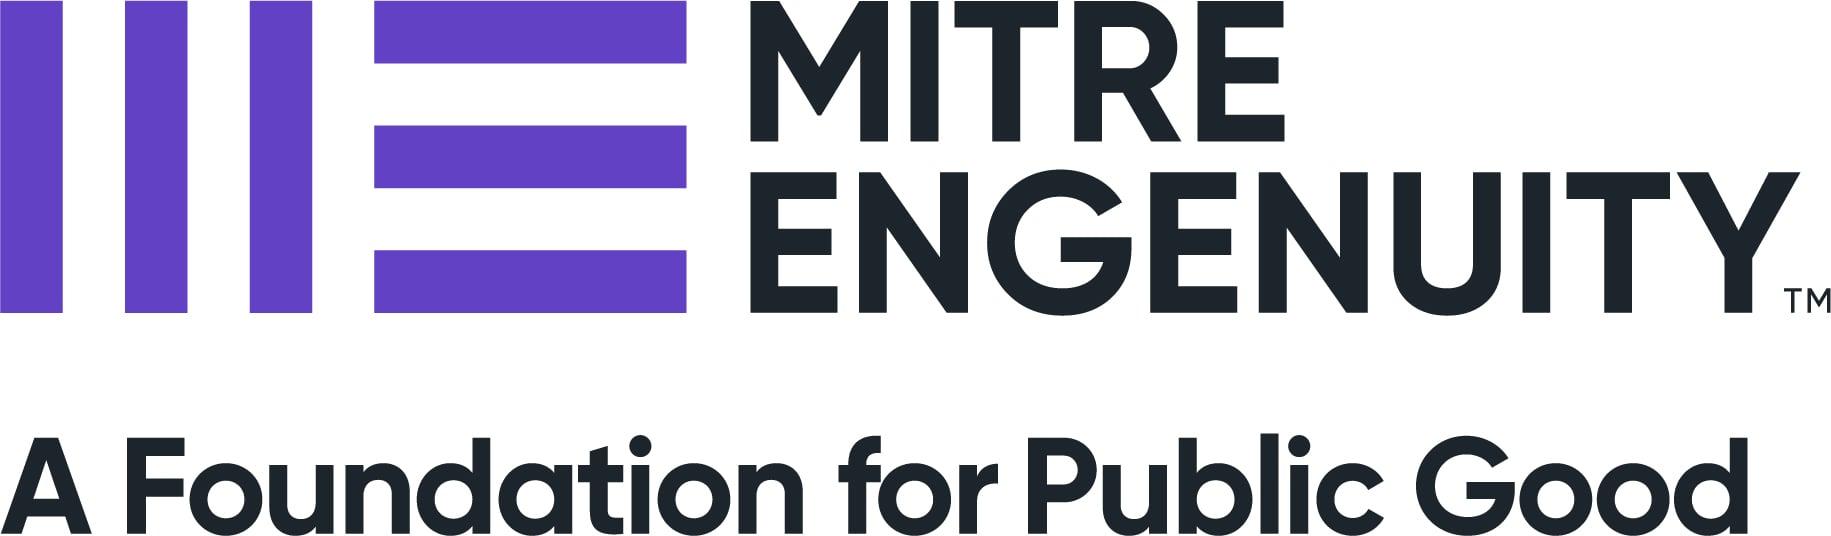 MITRE_Engenuity_logo_base_w-tagline_RGB_purple